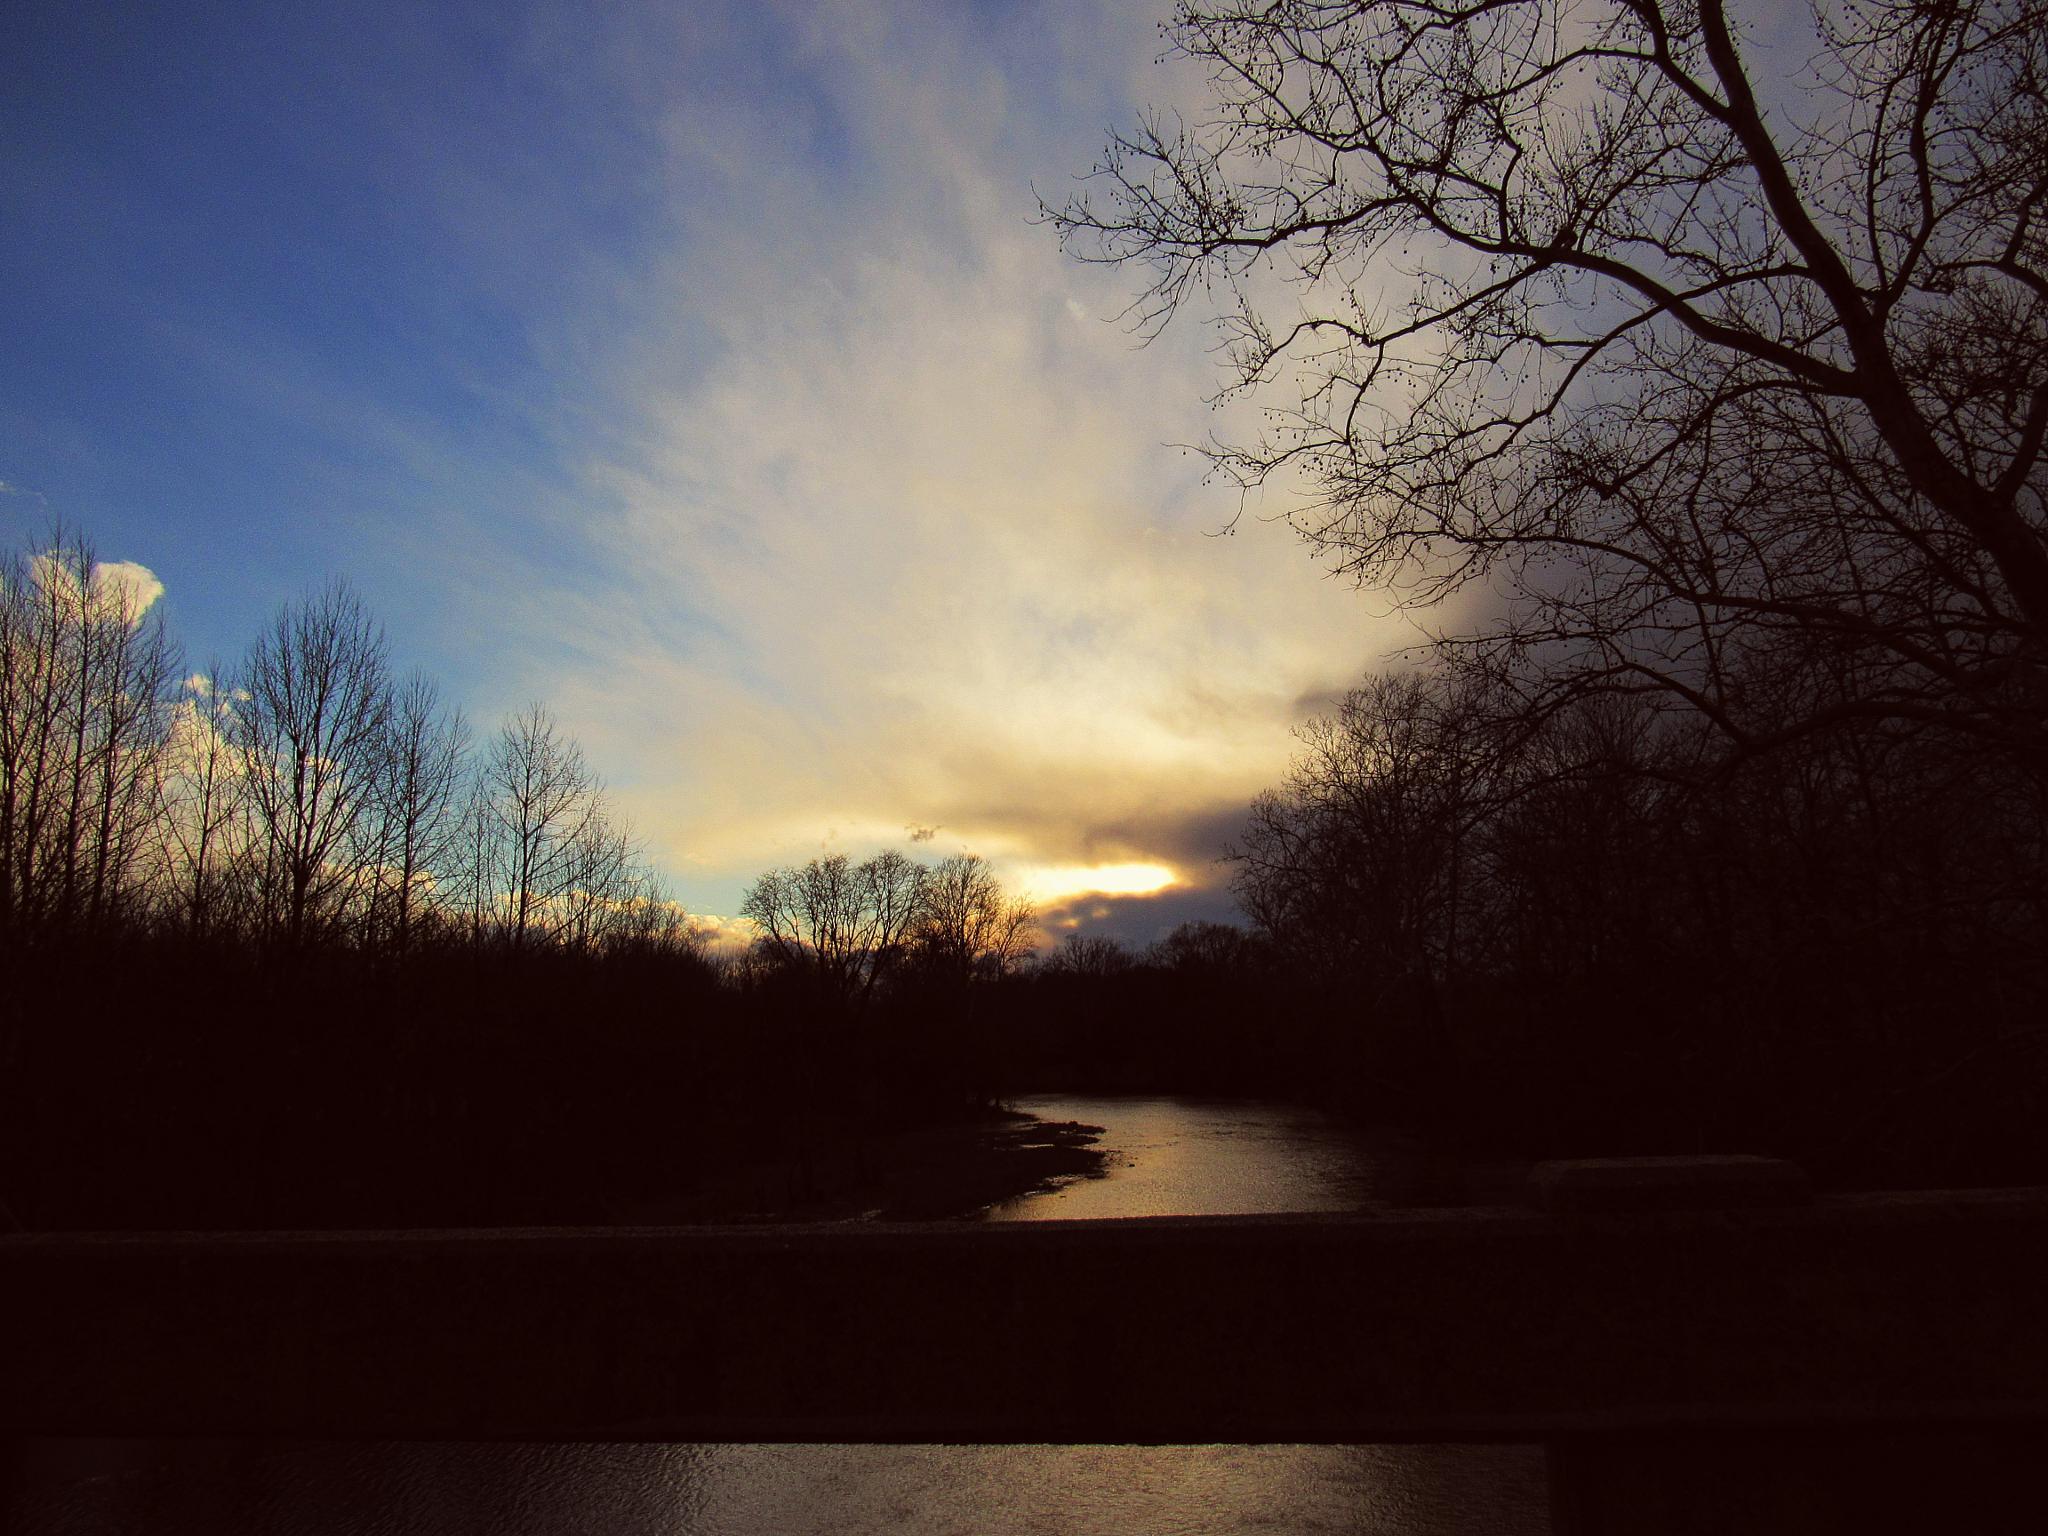 BACK ROADS SUNSET by Catherine Wegener